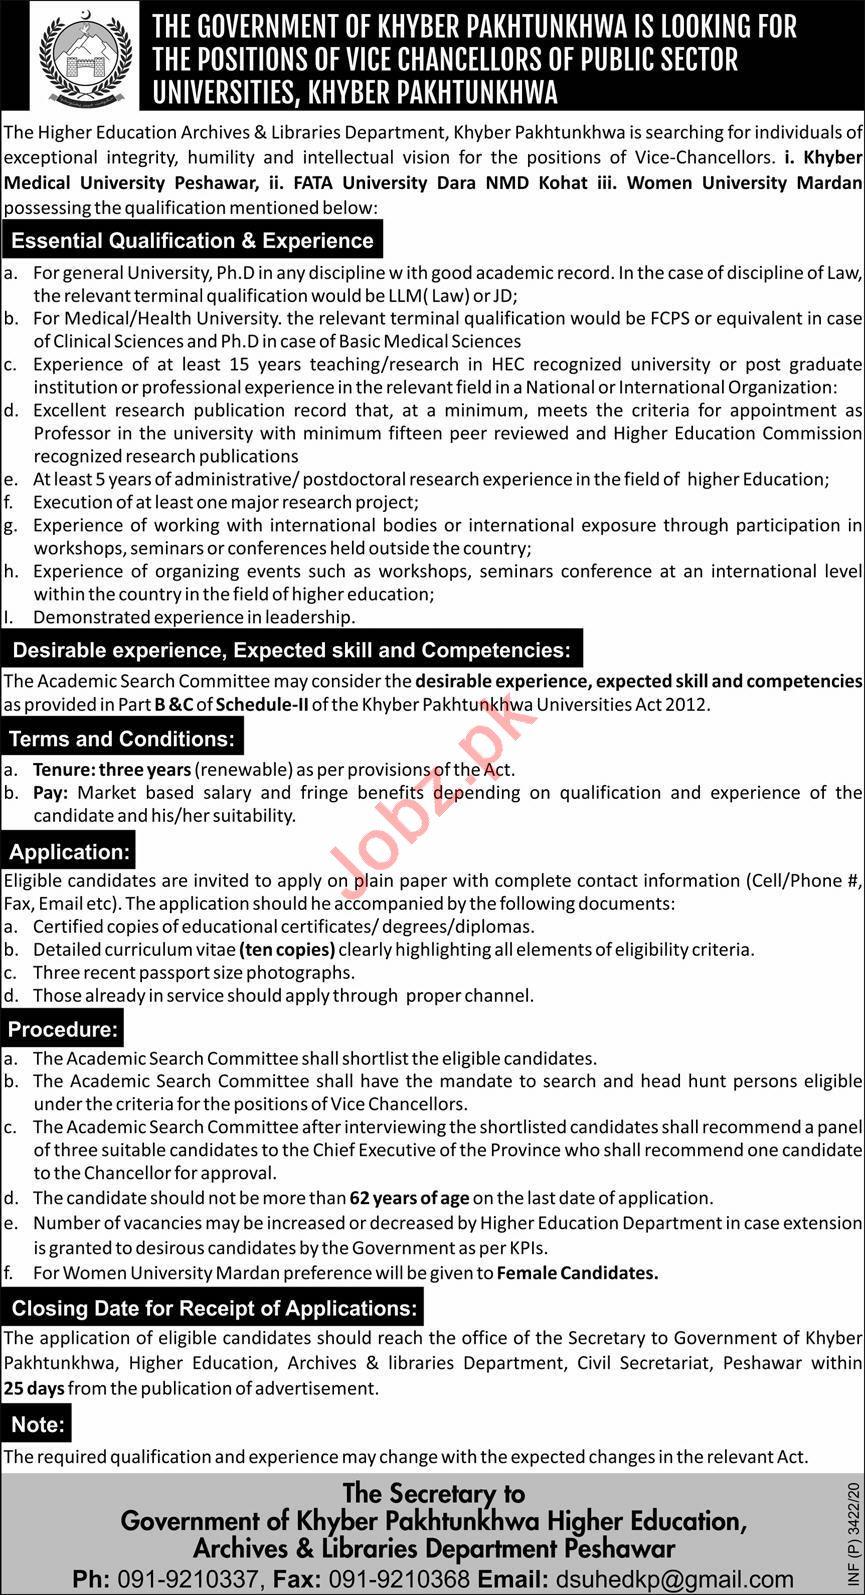 KPK Higher Education Department Jobs for Vice Chancellor